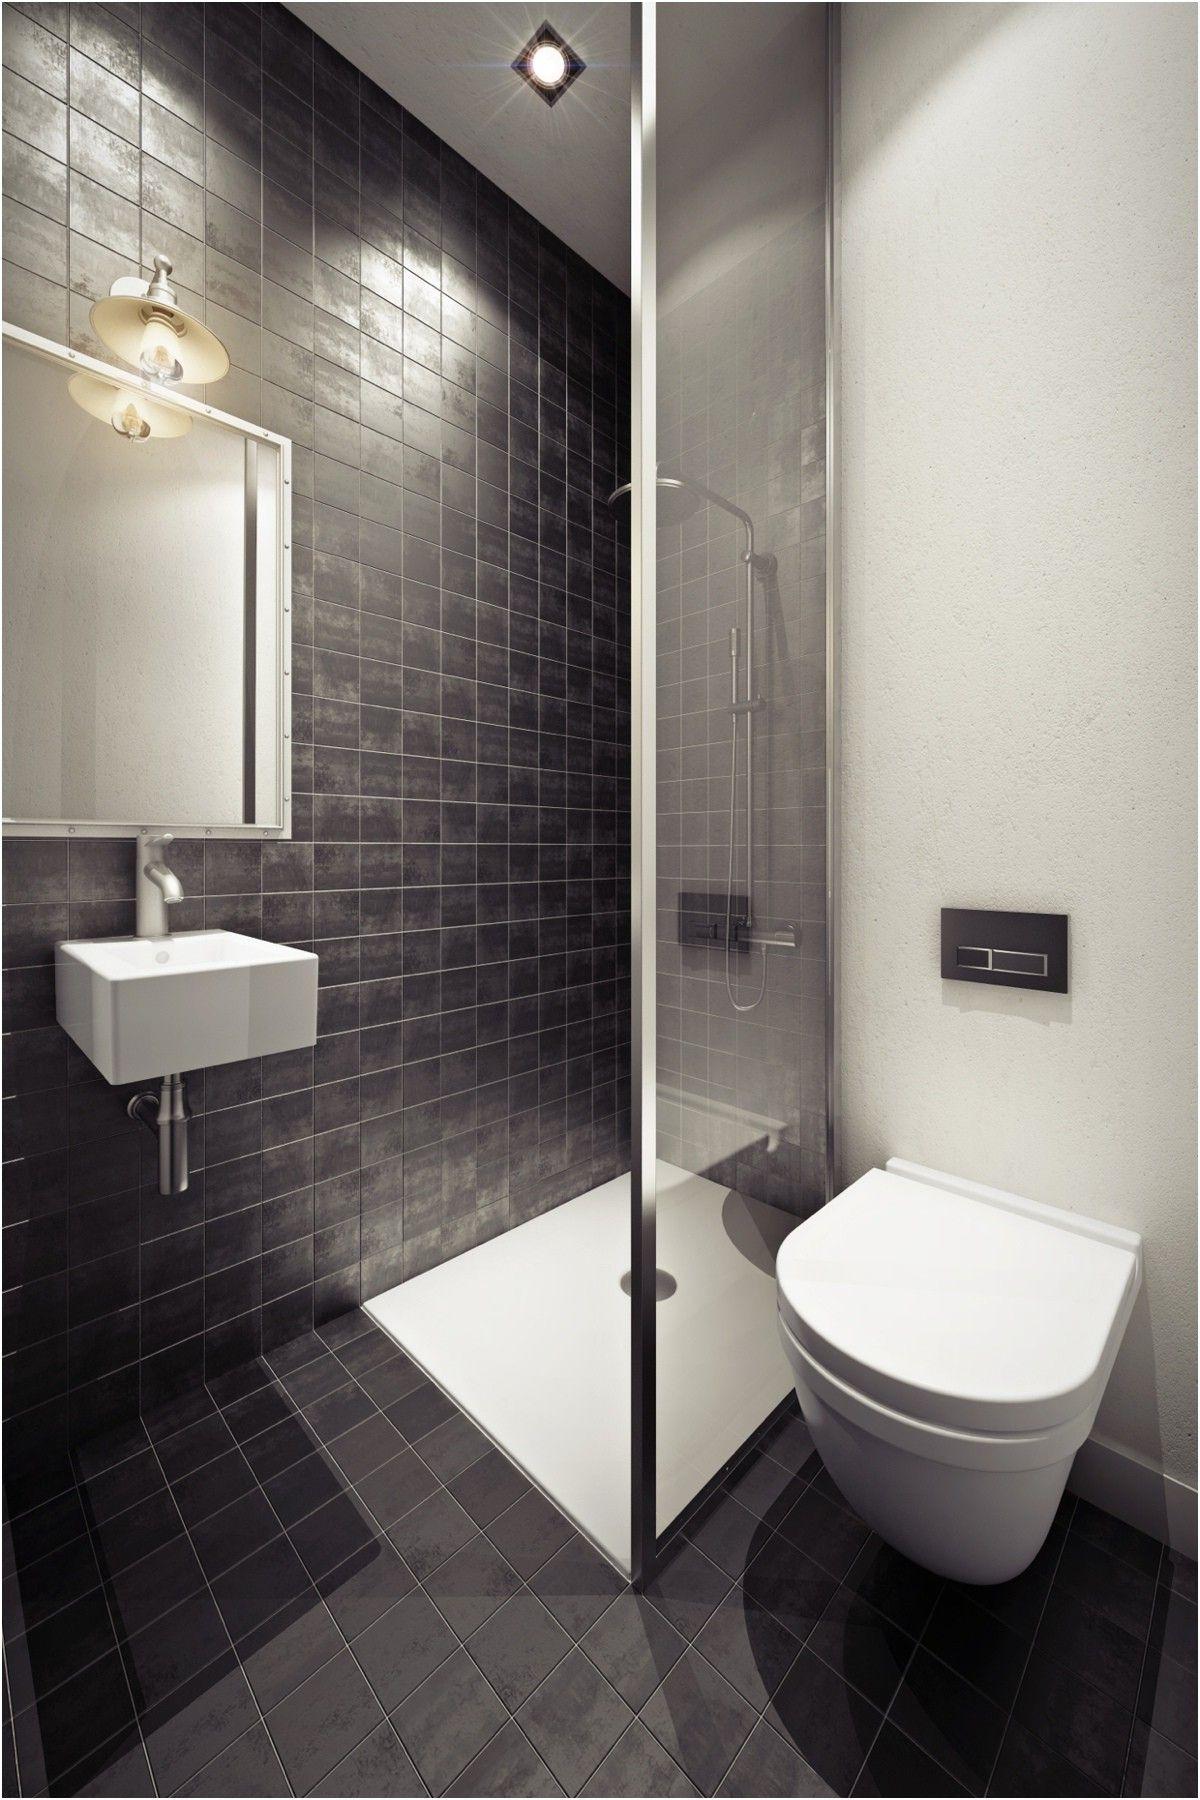 Photo Gallery Website  small square bathroom layout small bathroom layout plans from Square Bathroom Designs